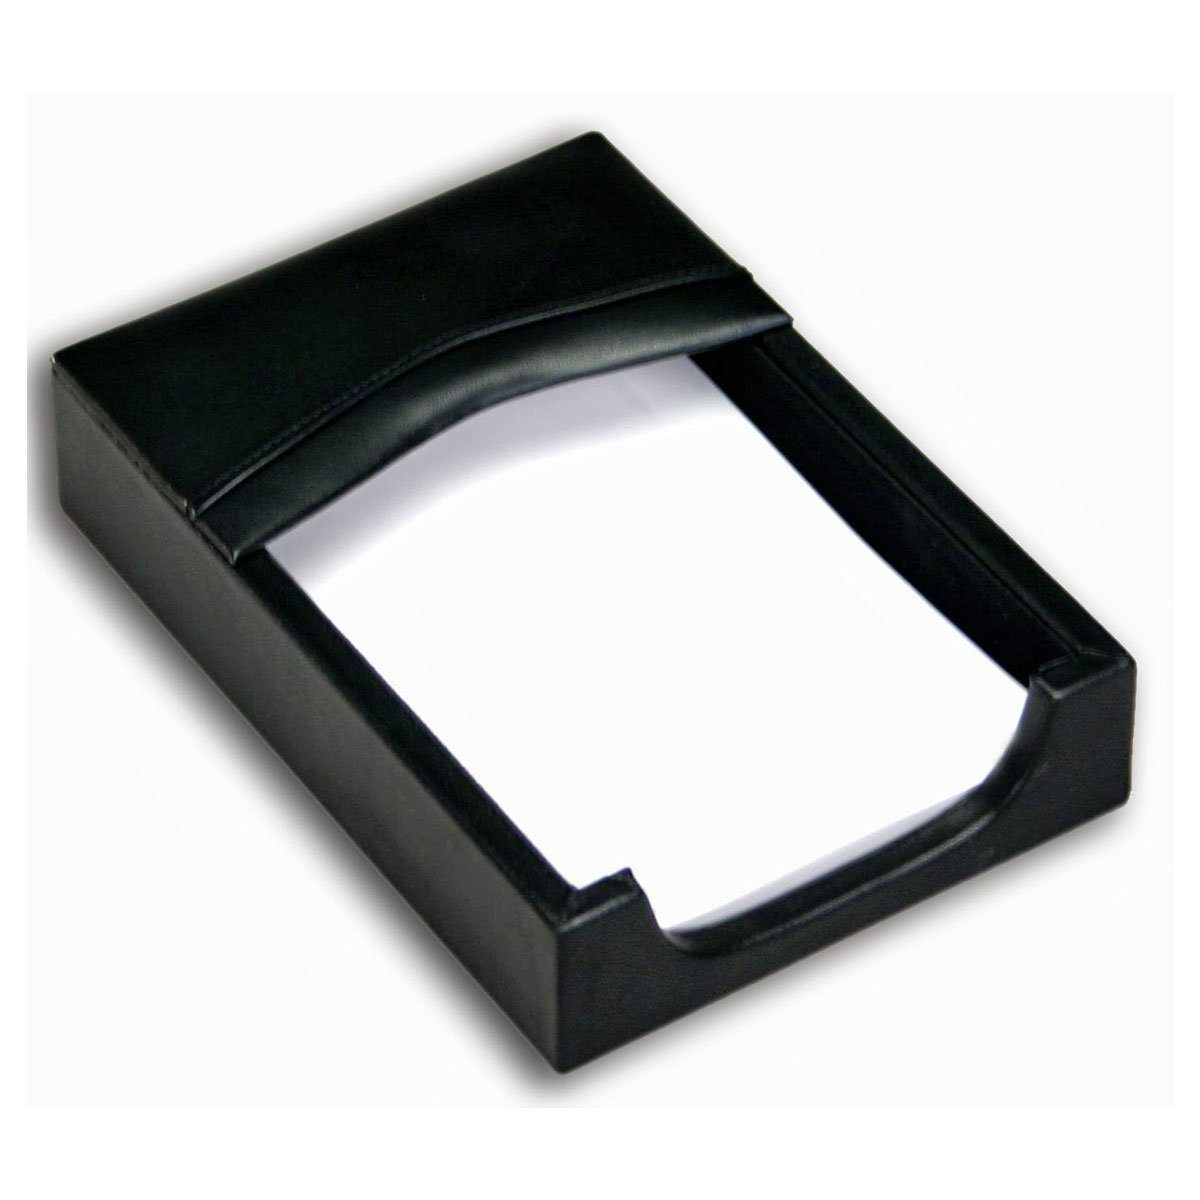 Dacasso Leather Desk Set, 8-Piece, Black by Dacasso (Image #5)